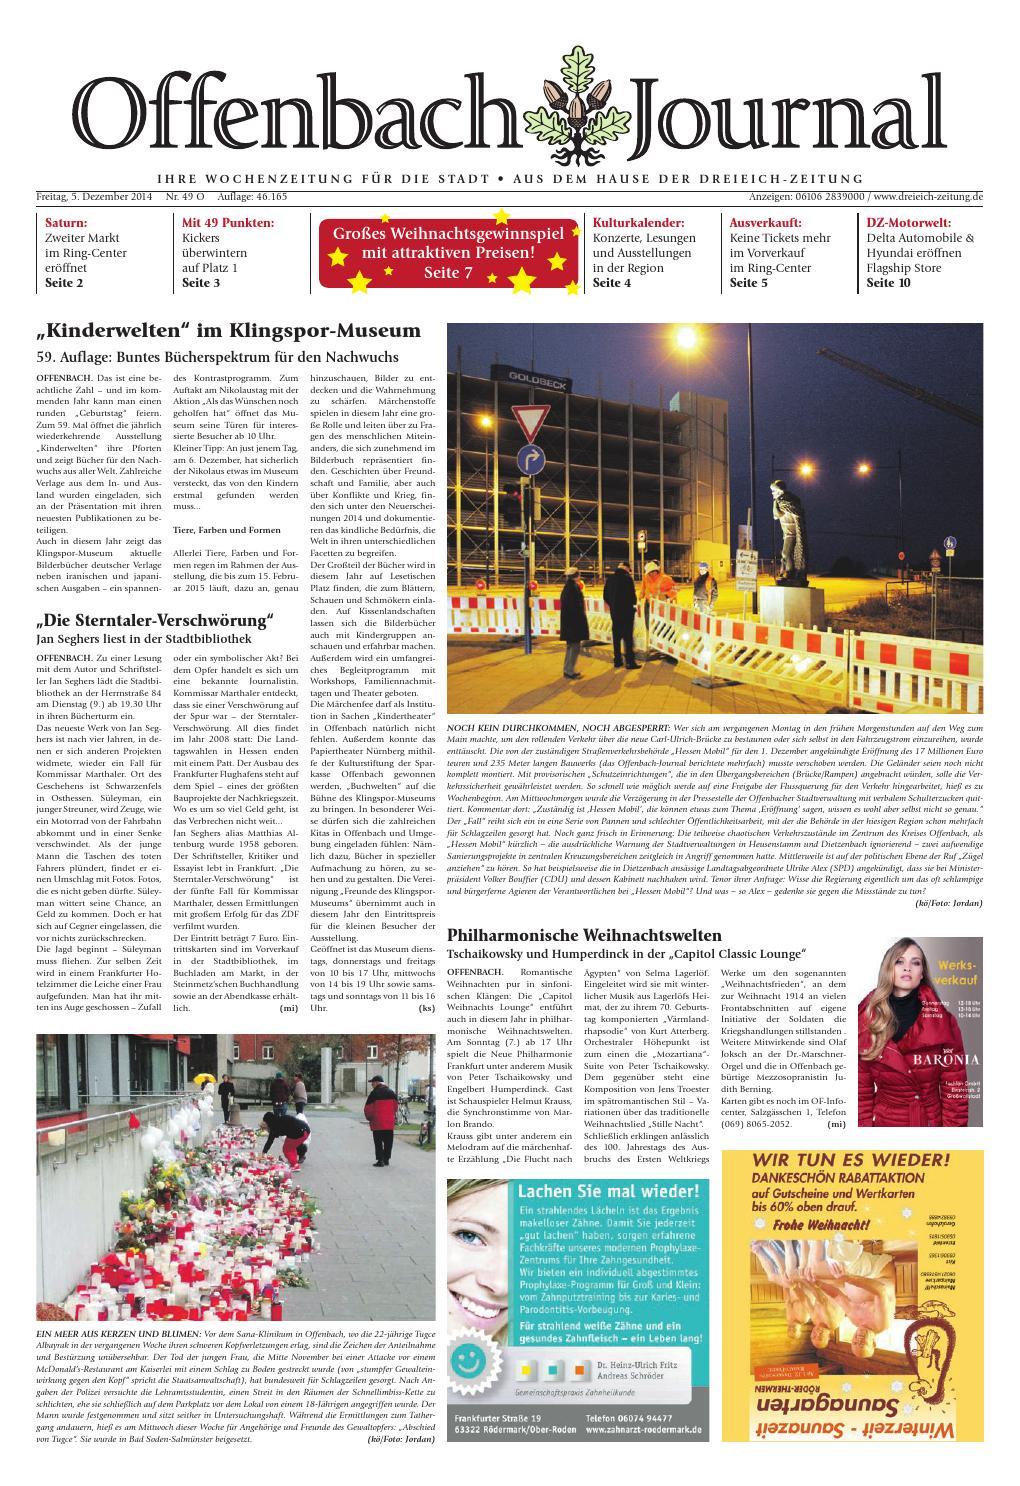 Oj online 049 14 by Dreieich ZeitungOffenbach Journal issuu